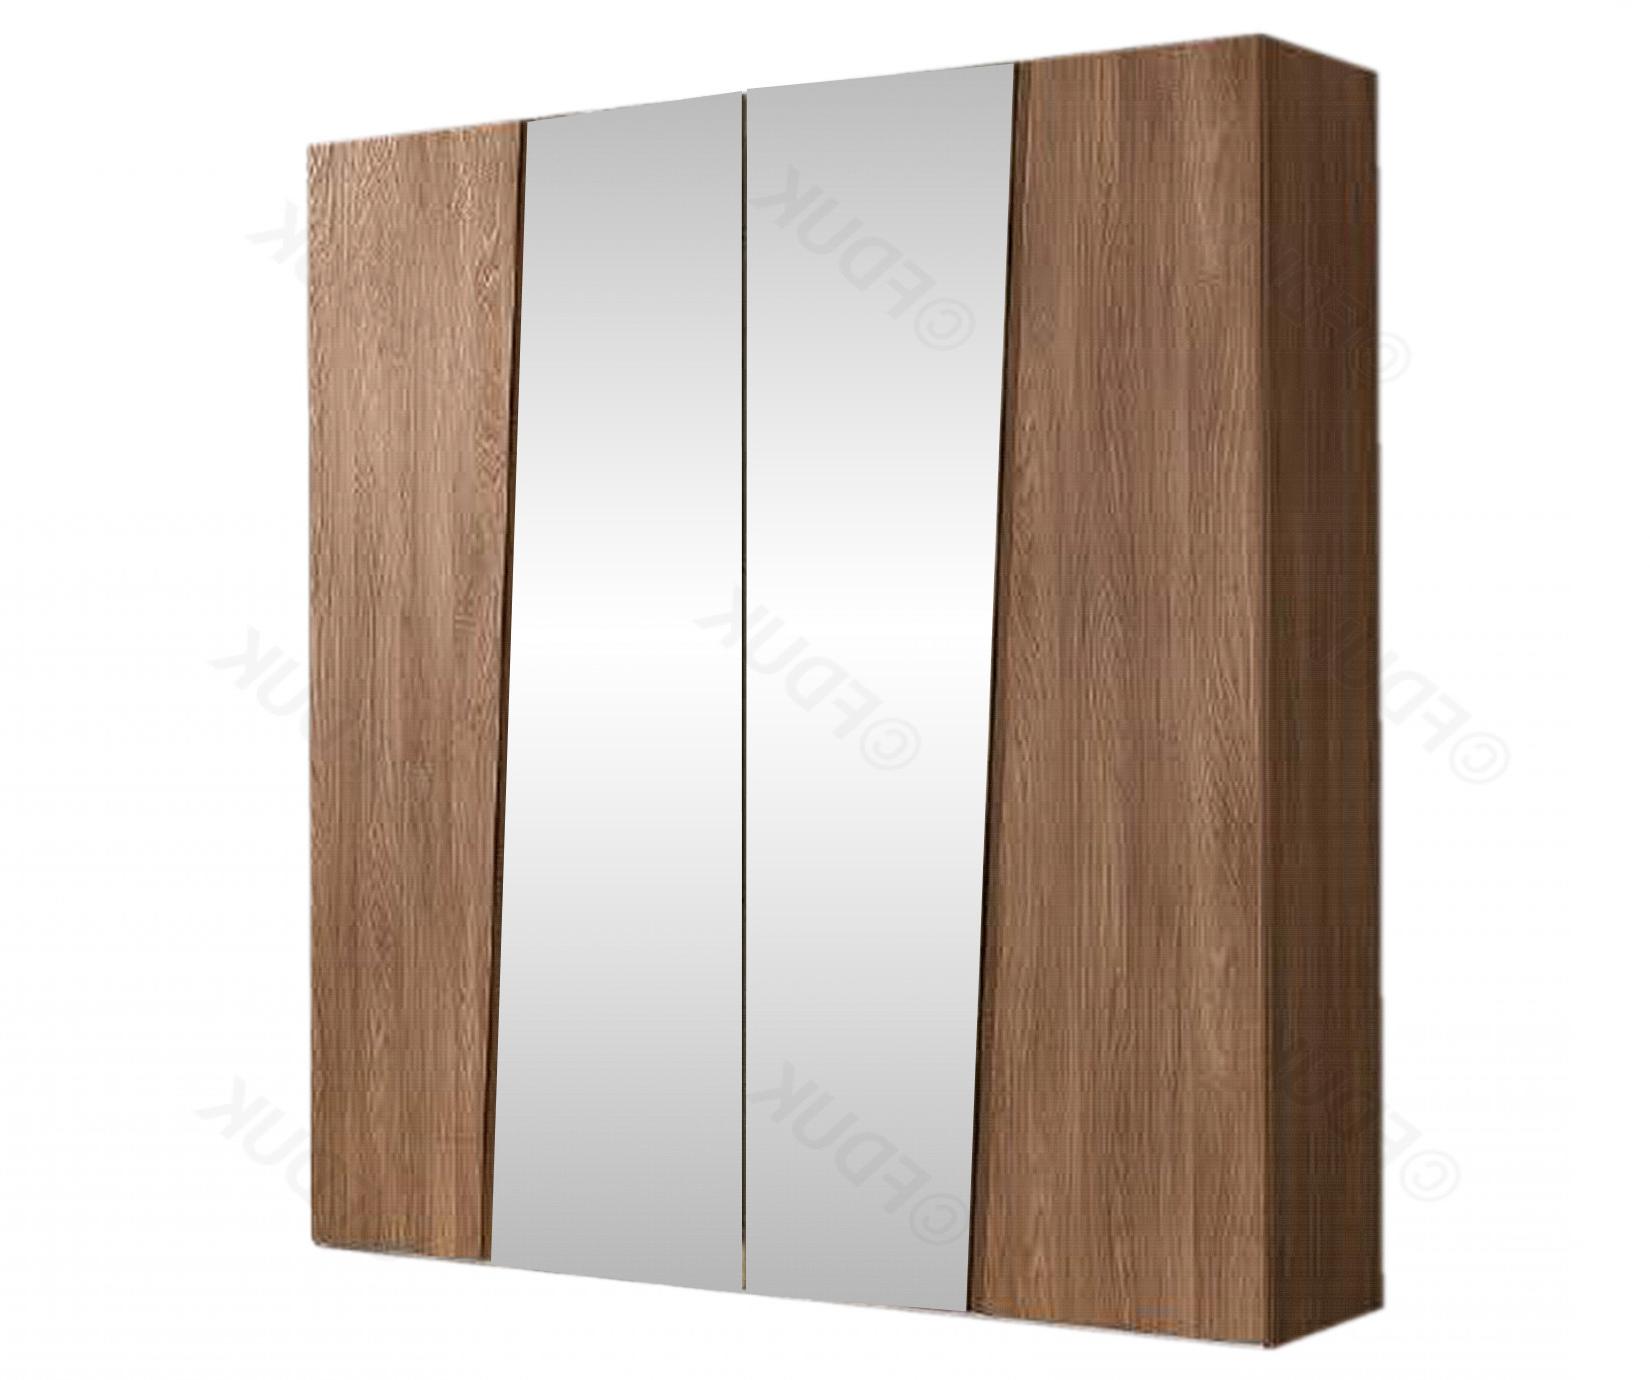 Storm Walnut Finish 4 Door Mirror Wardrobe (View 15 of 20)